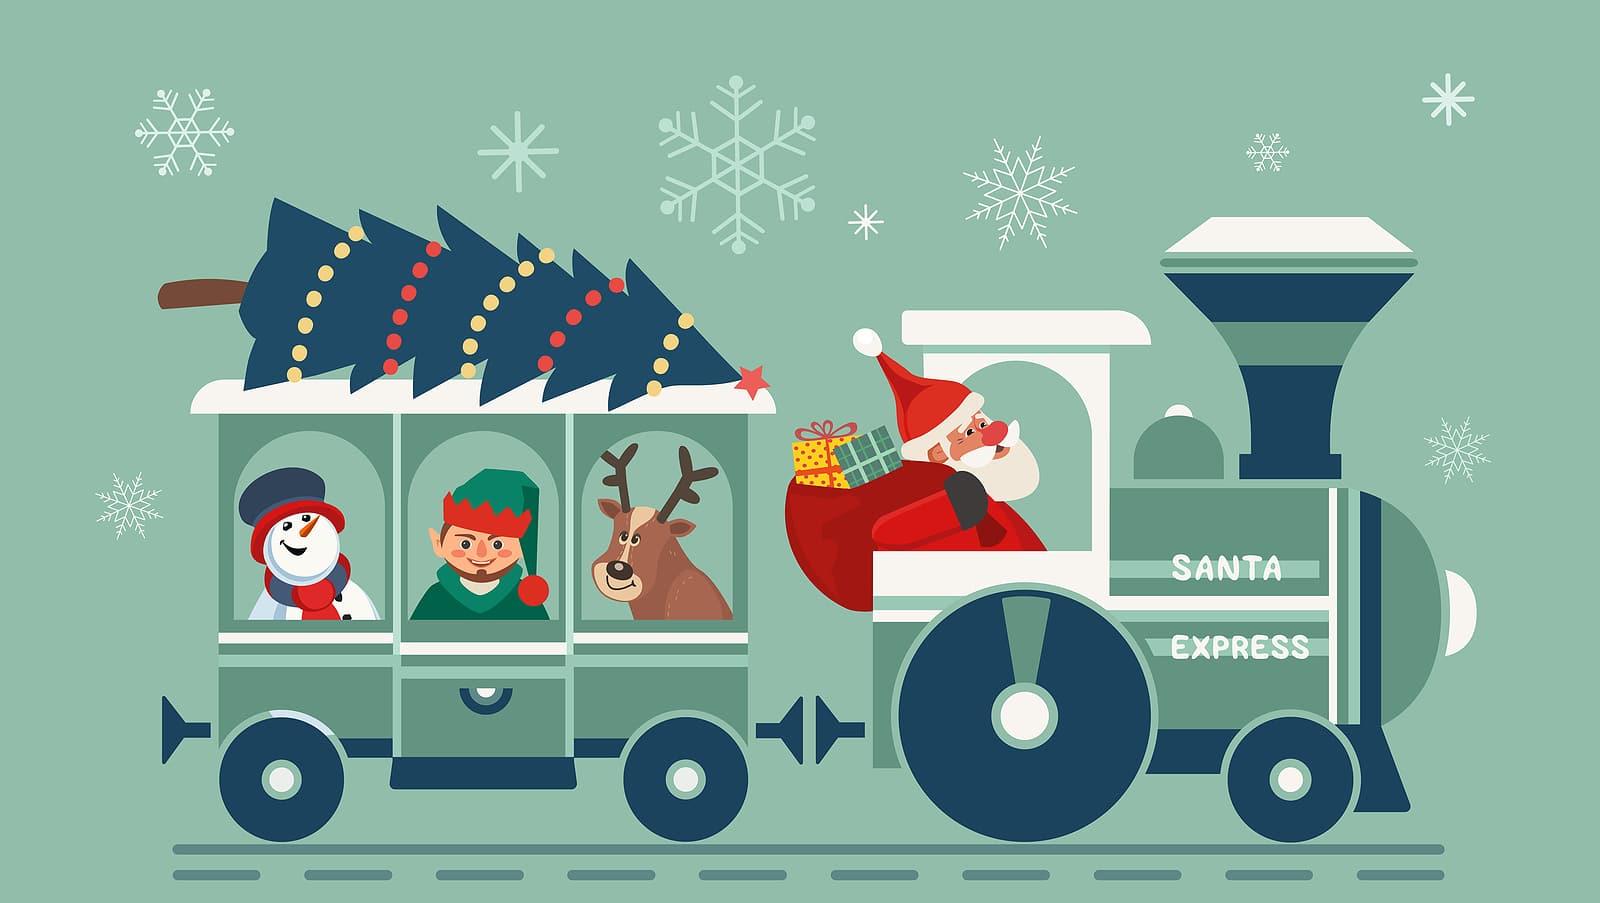 Happy holiday Santa train party vector poster. Comic steam Christmas Polar express cartoon. Santa with elf, deer, snowman fun railroad travel. Holiday season kids celebration magical Christmas train